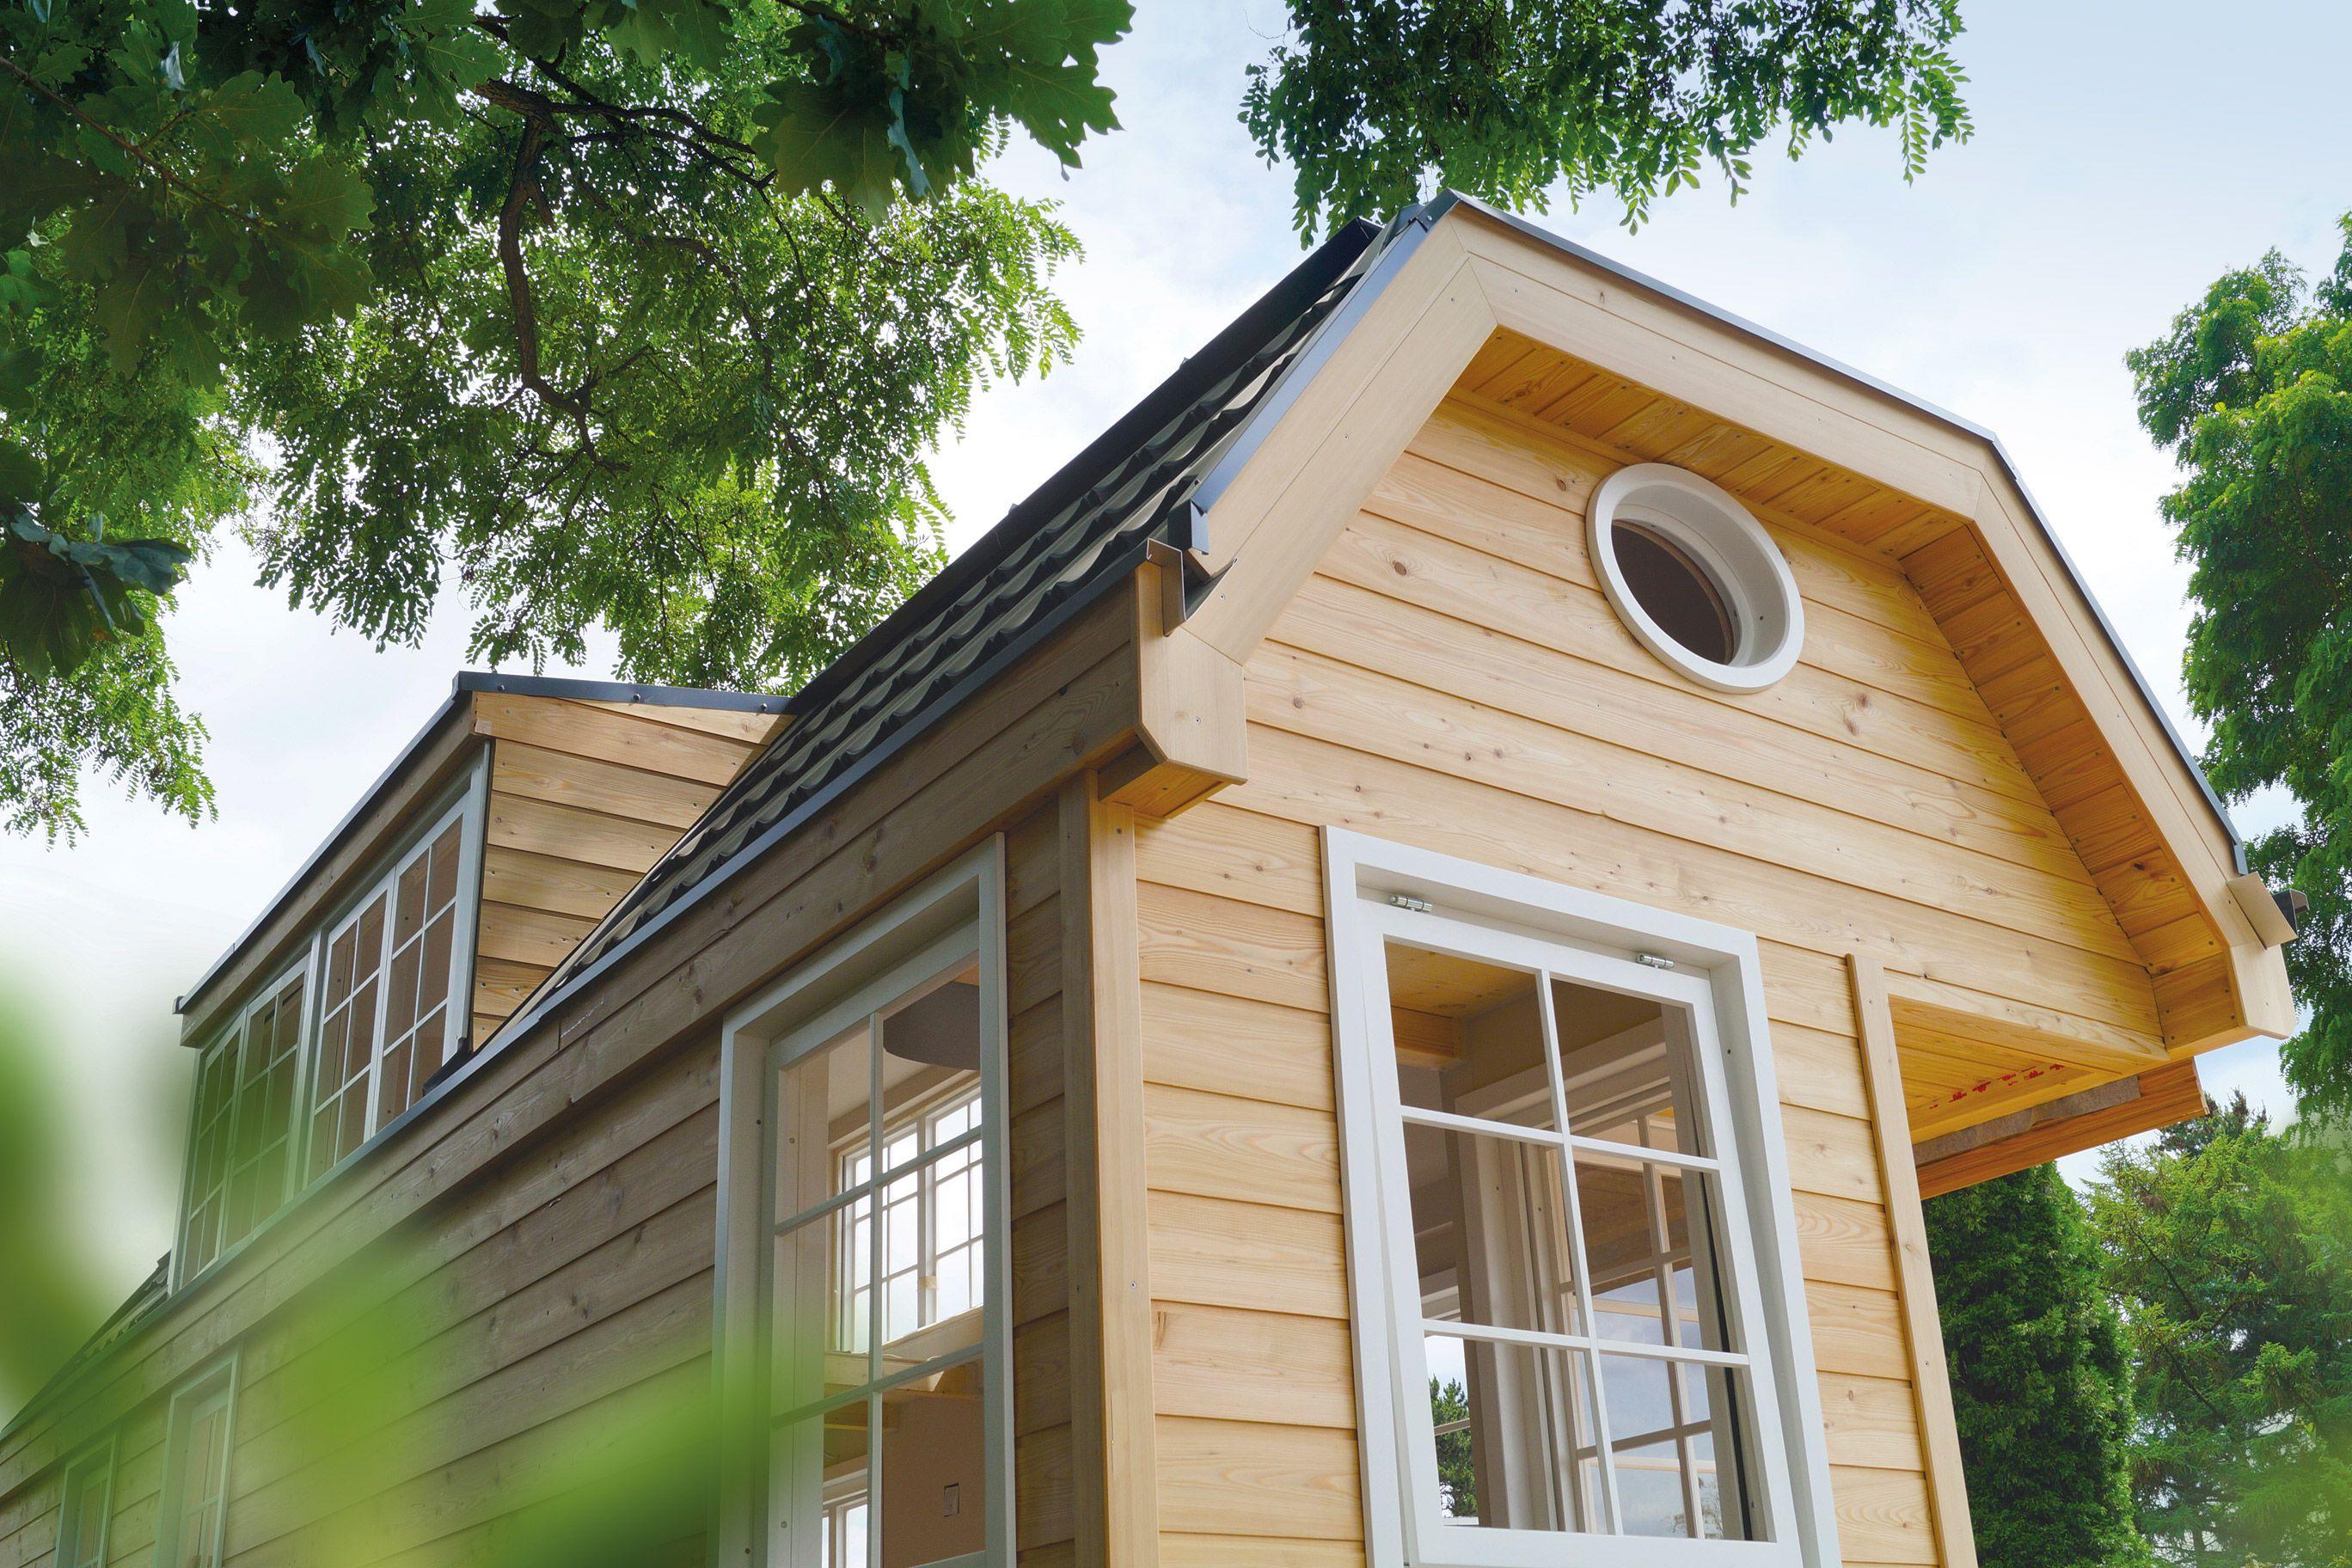 sch n sieht es aus unser tiny house wunschliste dreams come true pinterest. Black Bedroom Furniture Sets. Home Design Ideas